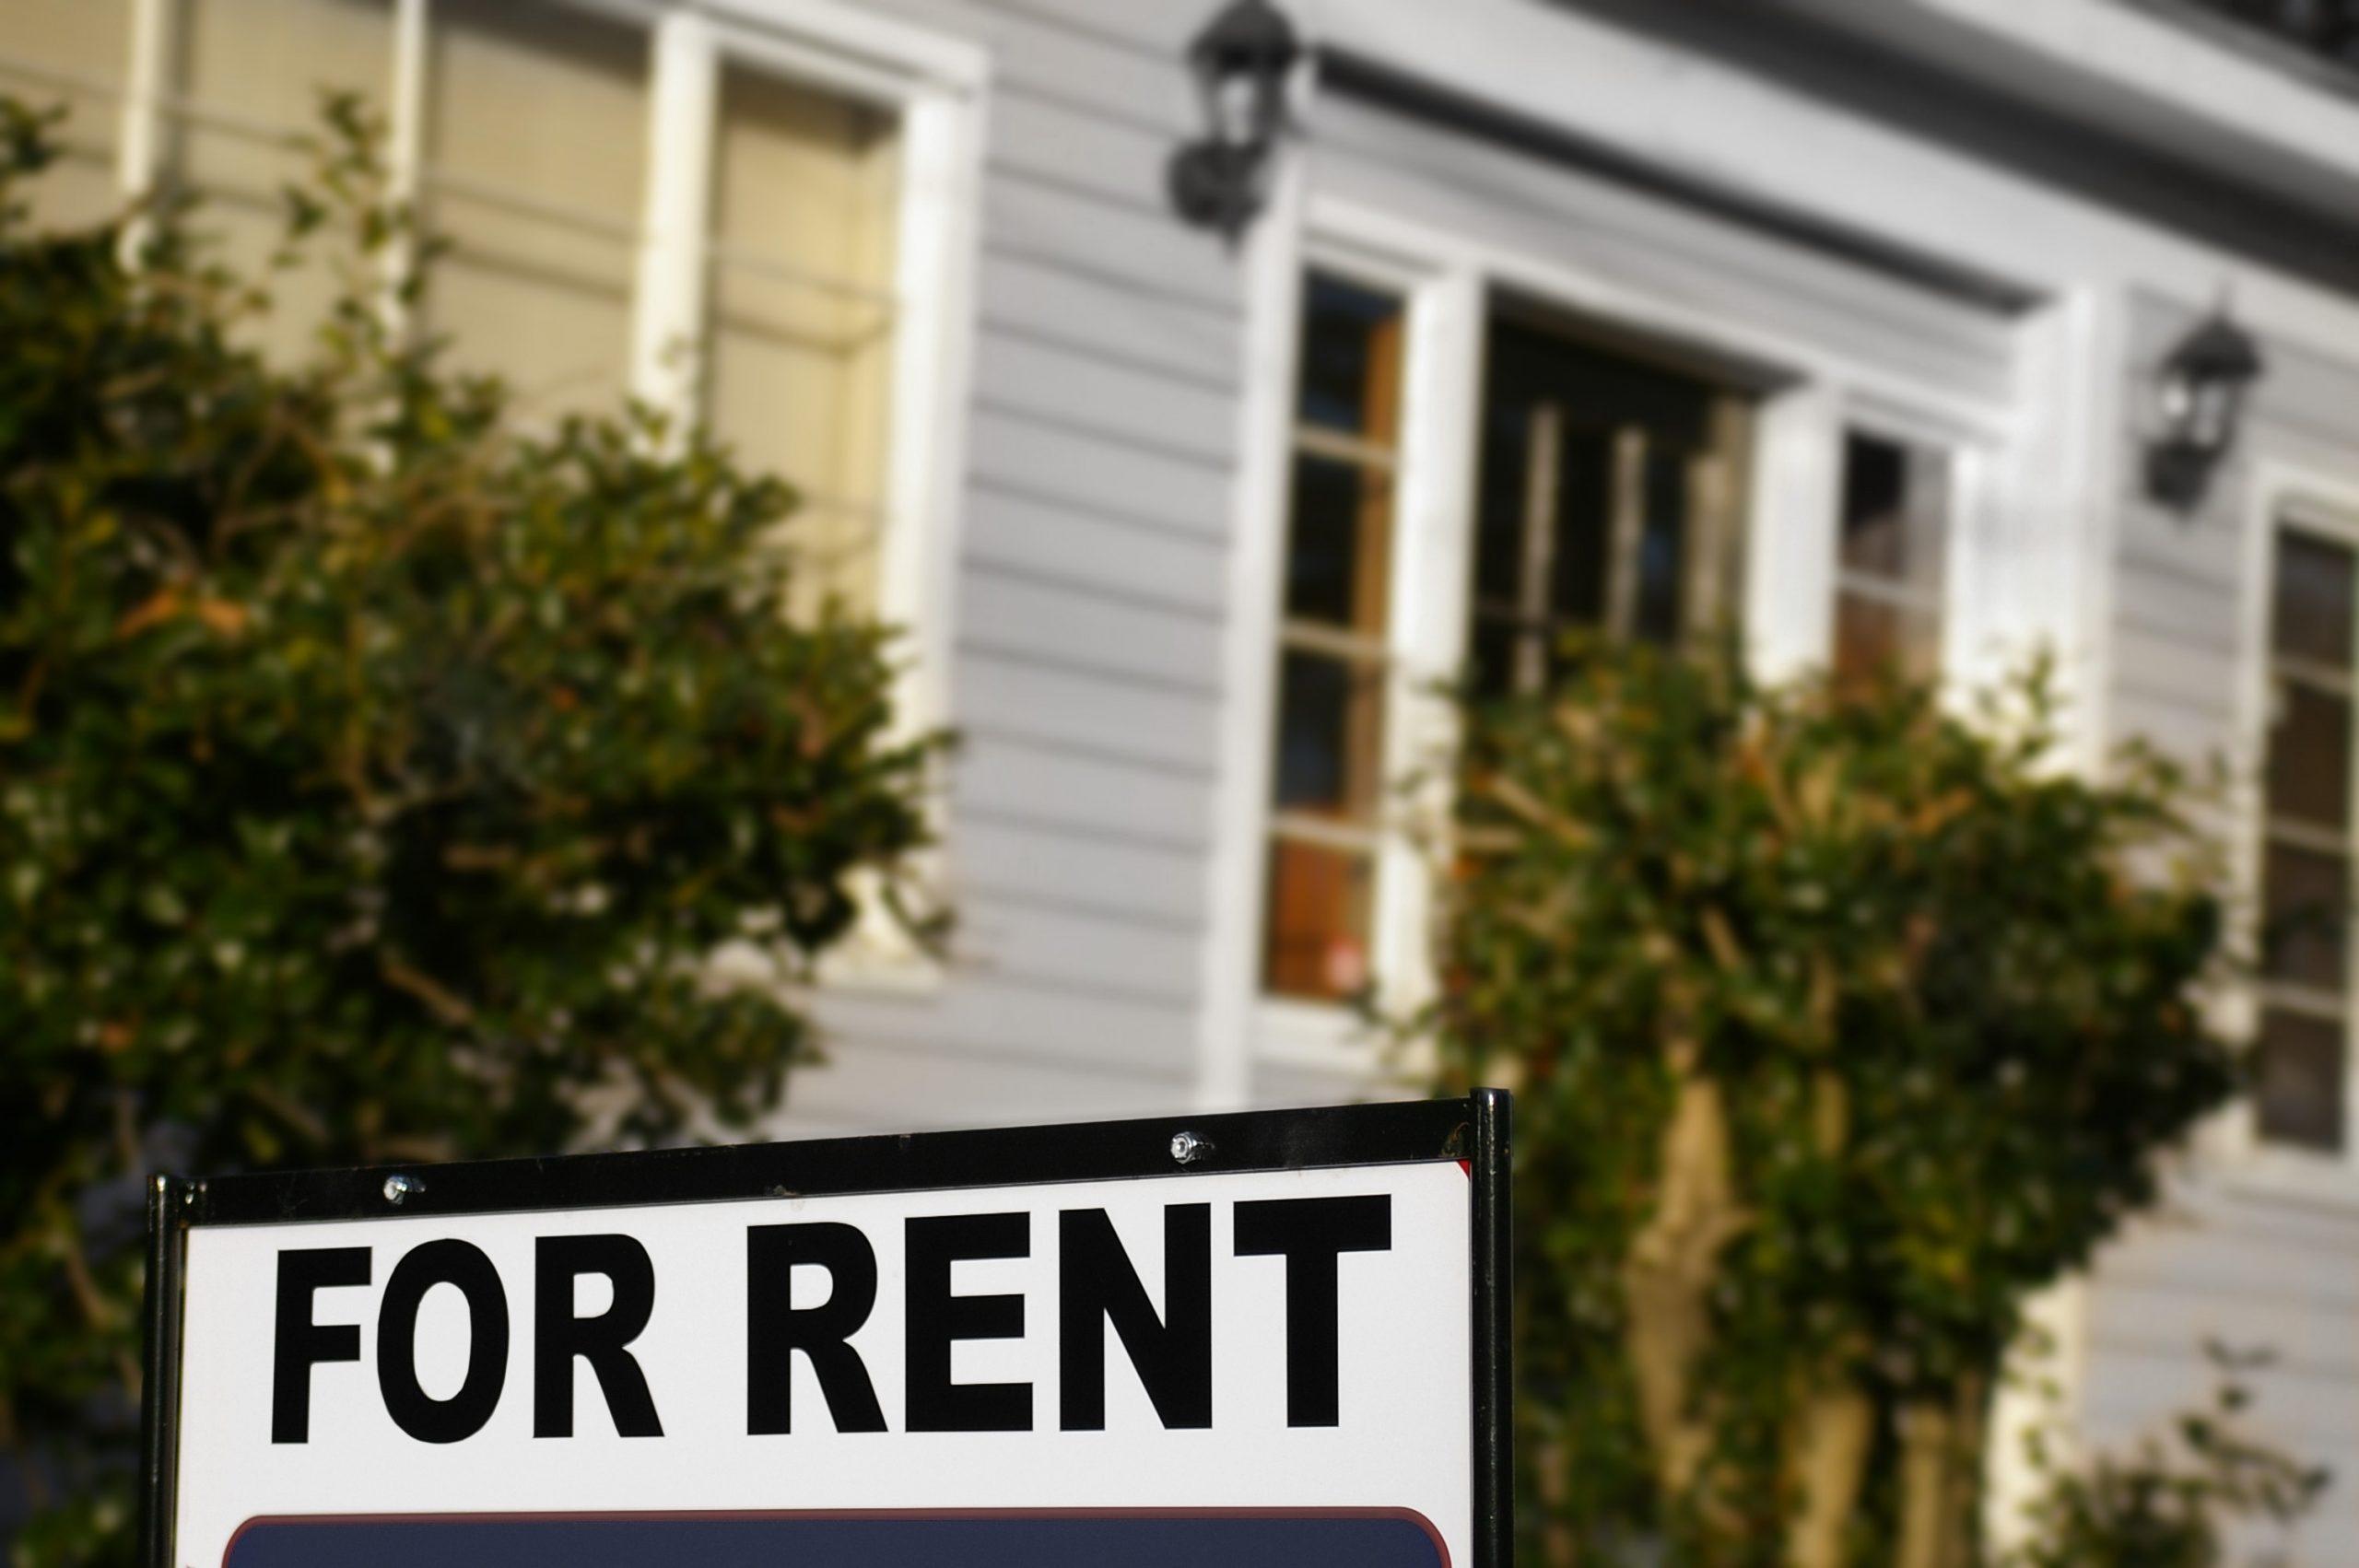 Portland Landlord-Tenant Mediation Program